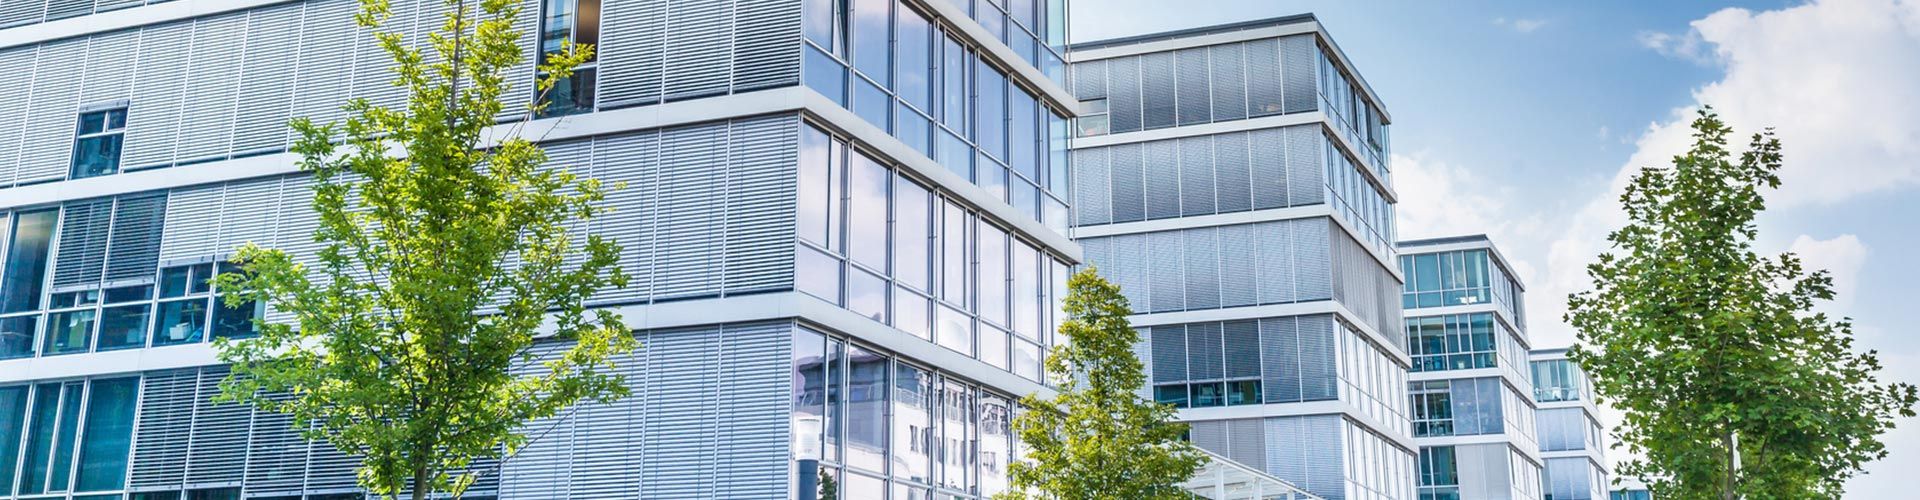 LVB Hygienedienst GmbH in Atting nahe Straubing